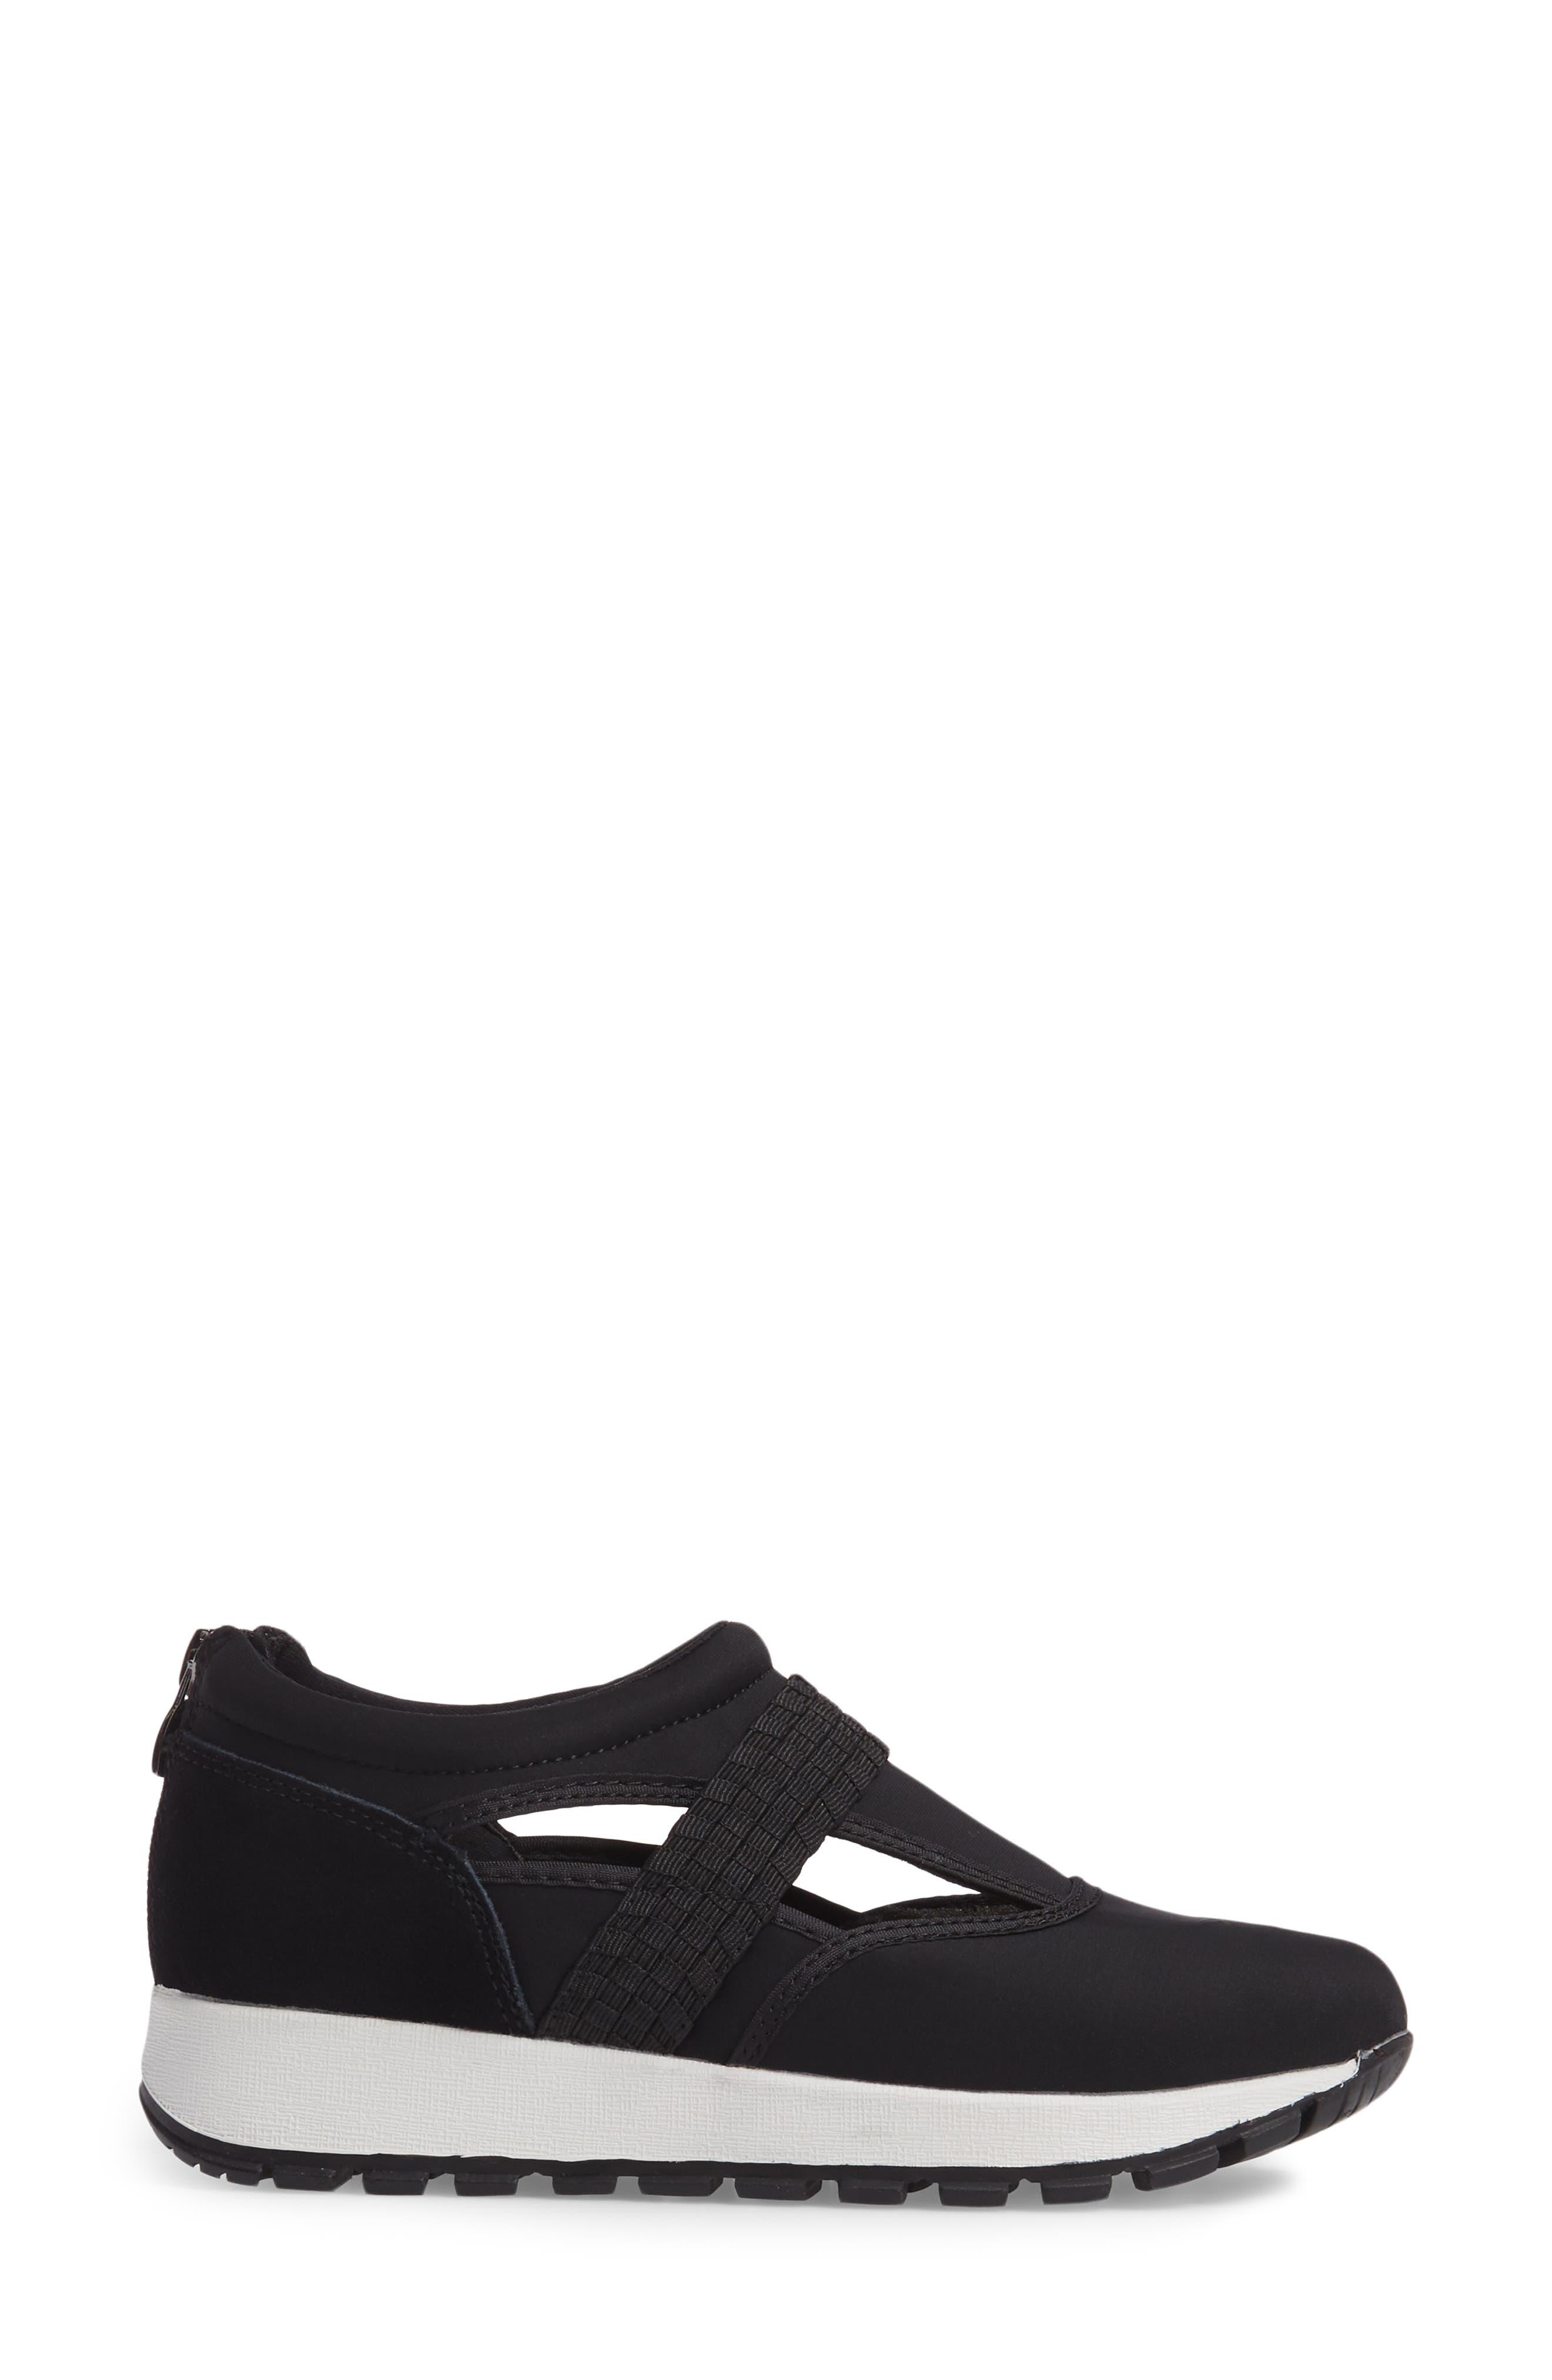 Bernie Mev Janelle Sneaker,                             Alternate thumbnail 3, color,                             BLACK FABRIC